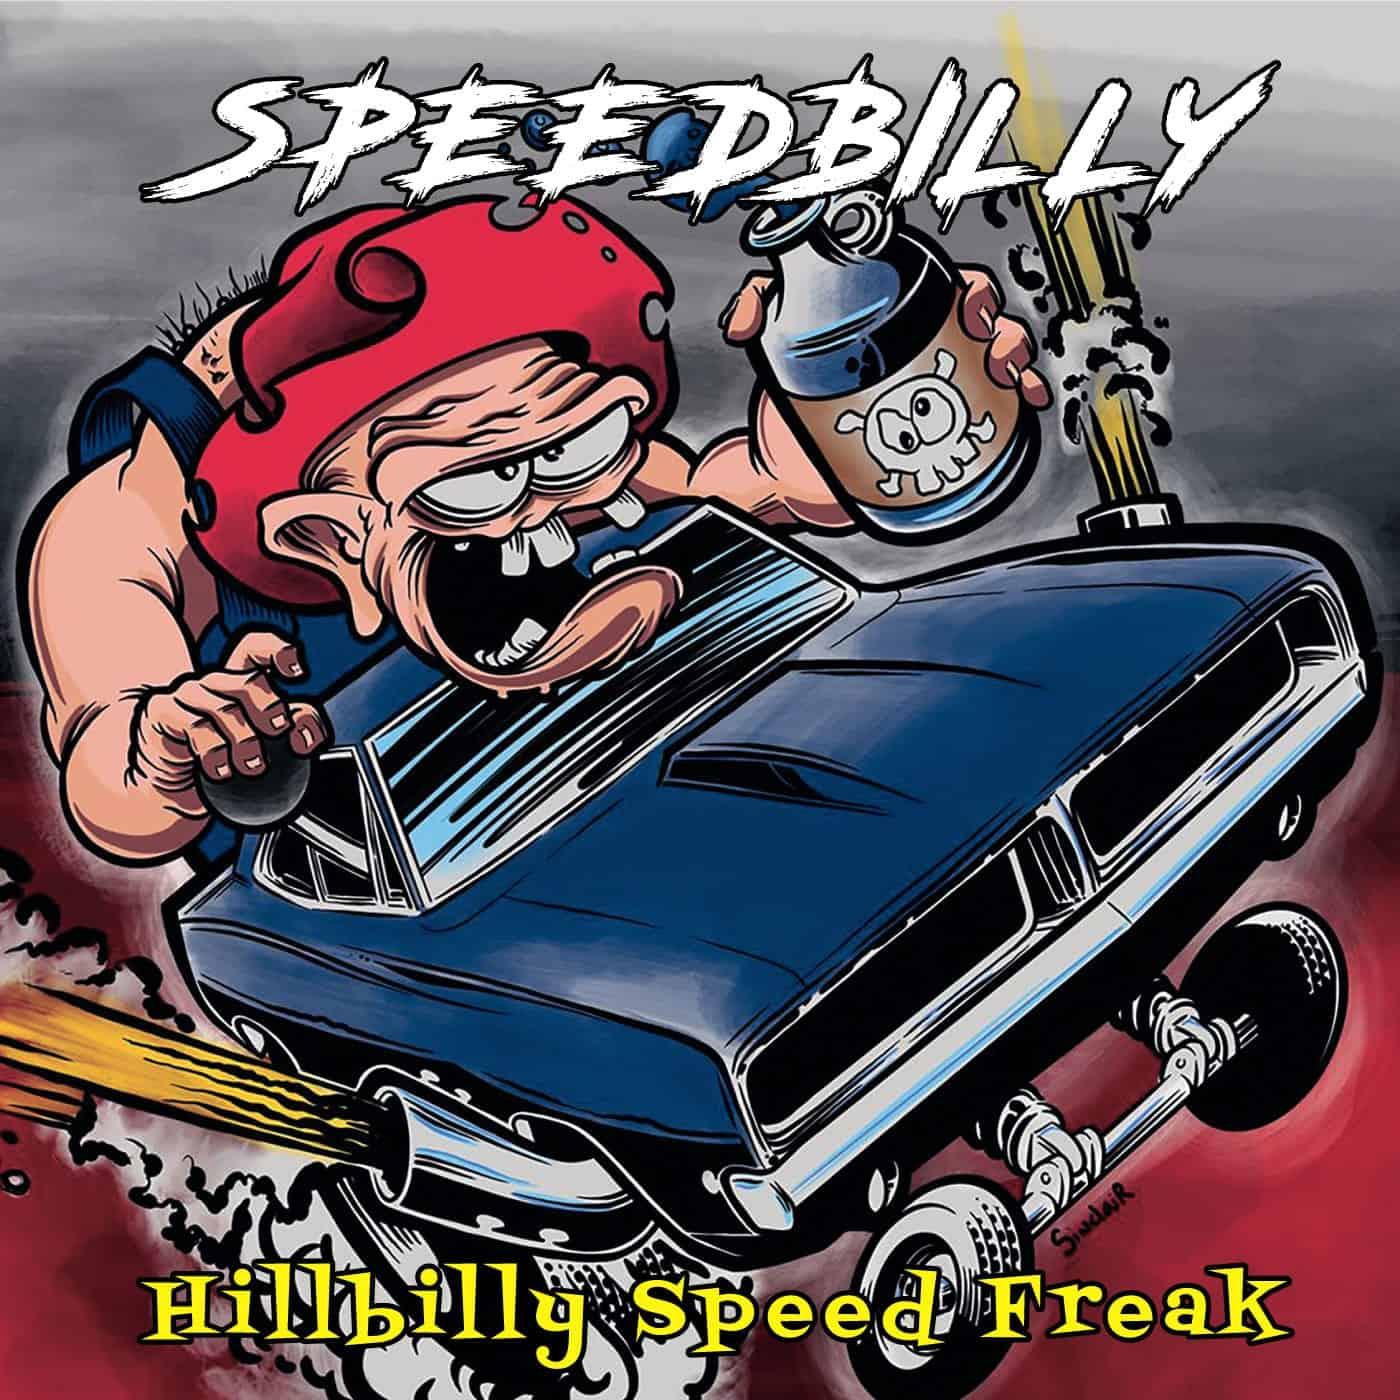 Ep Review Speedbilly Hillbilly Speed Freak Self Released Games Brrraaains A Head Banging Life